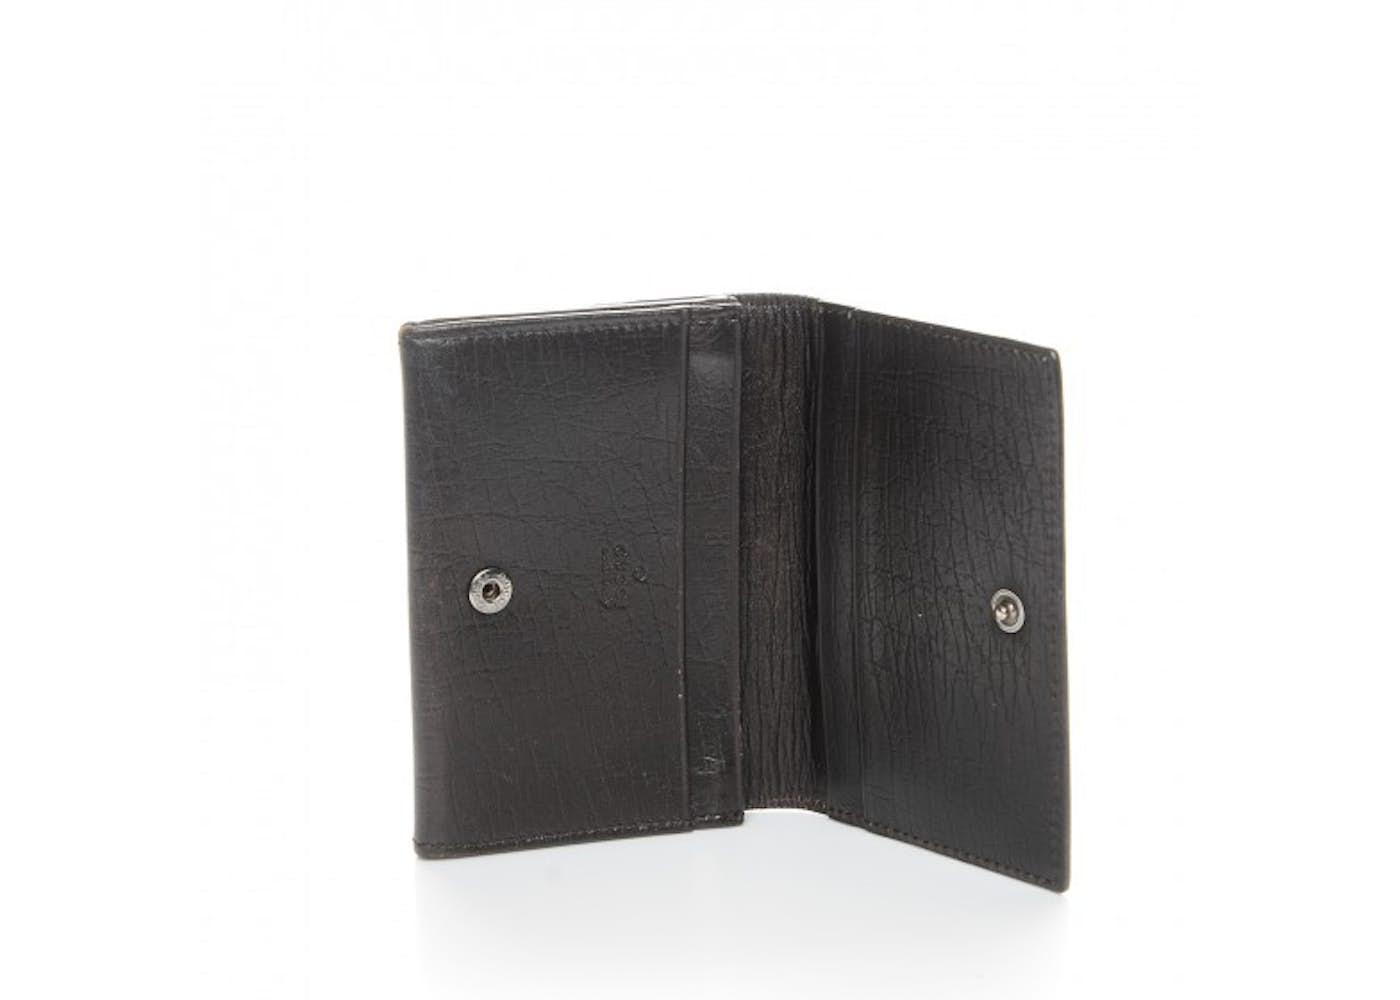 Gucci Business Card Holder Wallet Monogram GG Plus Brown/Beige